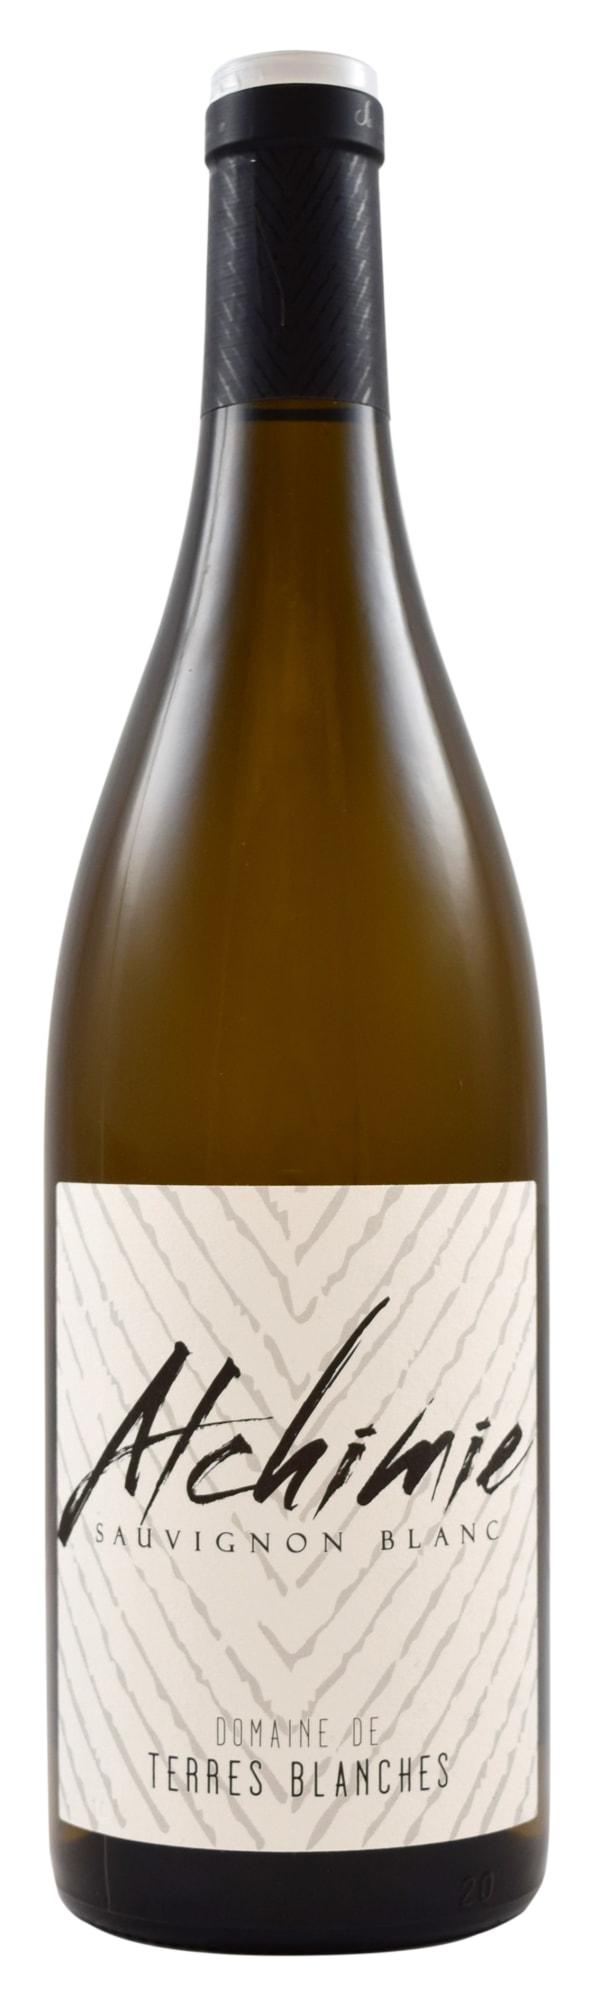 Alchimie Sauvignon Blanc 2016